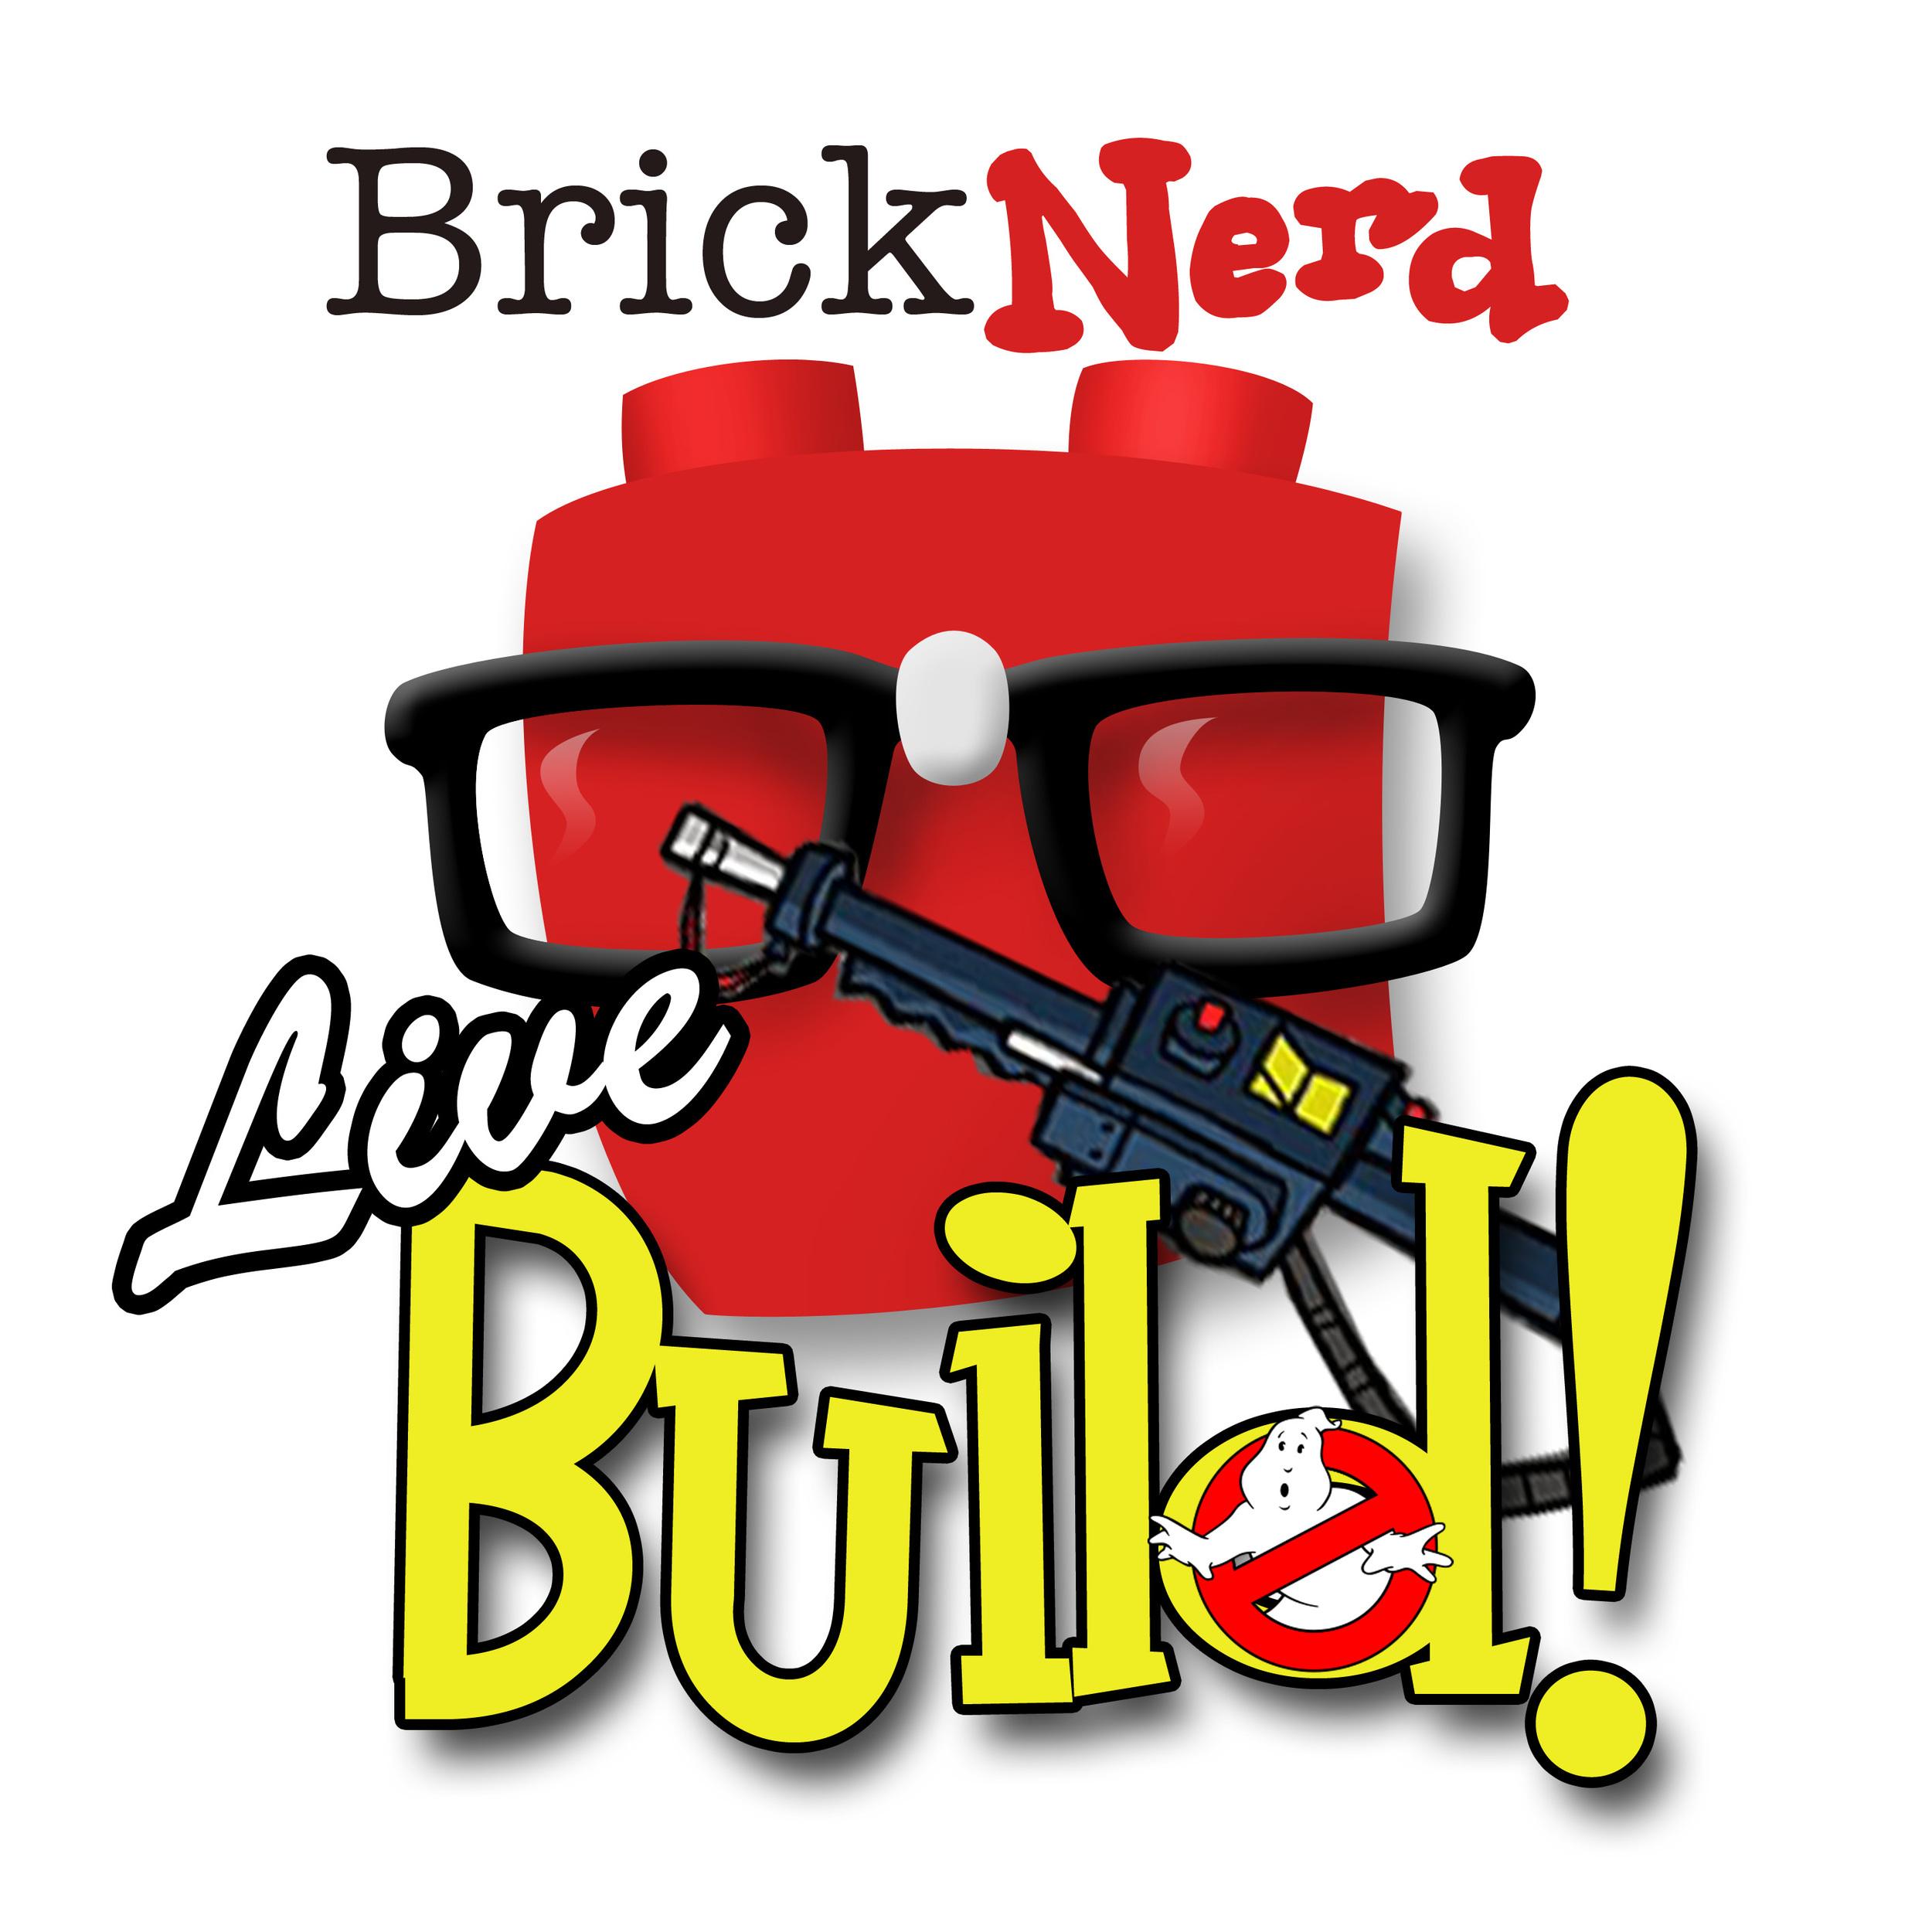 BrickNerd_Live_Build_GB.jpg